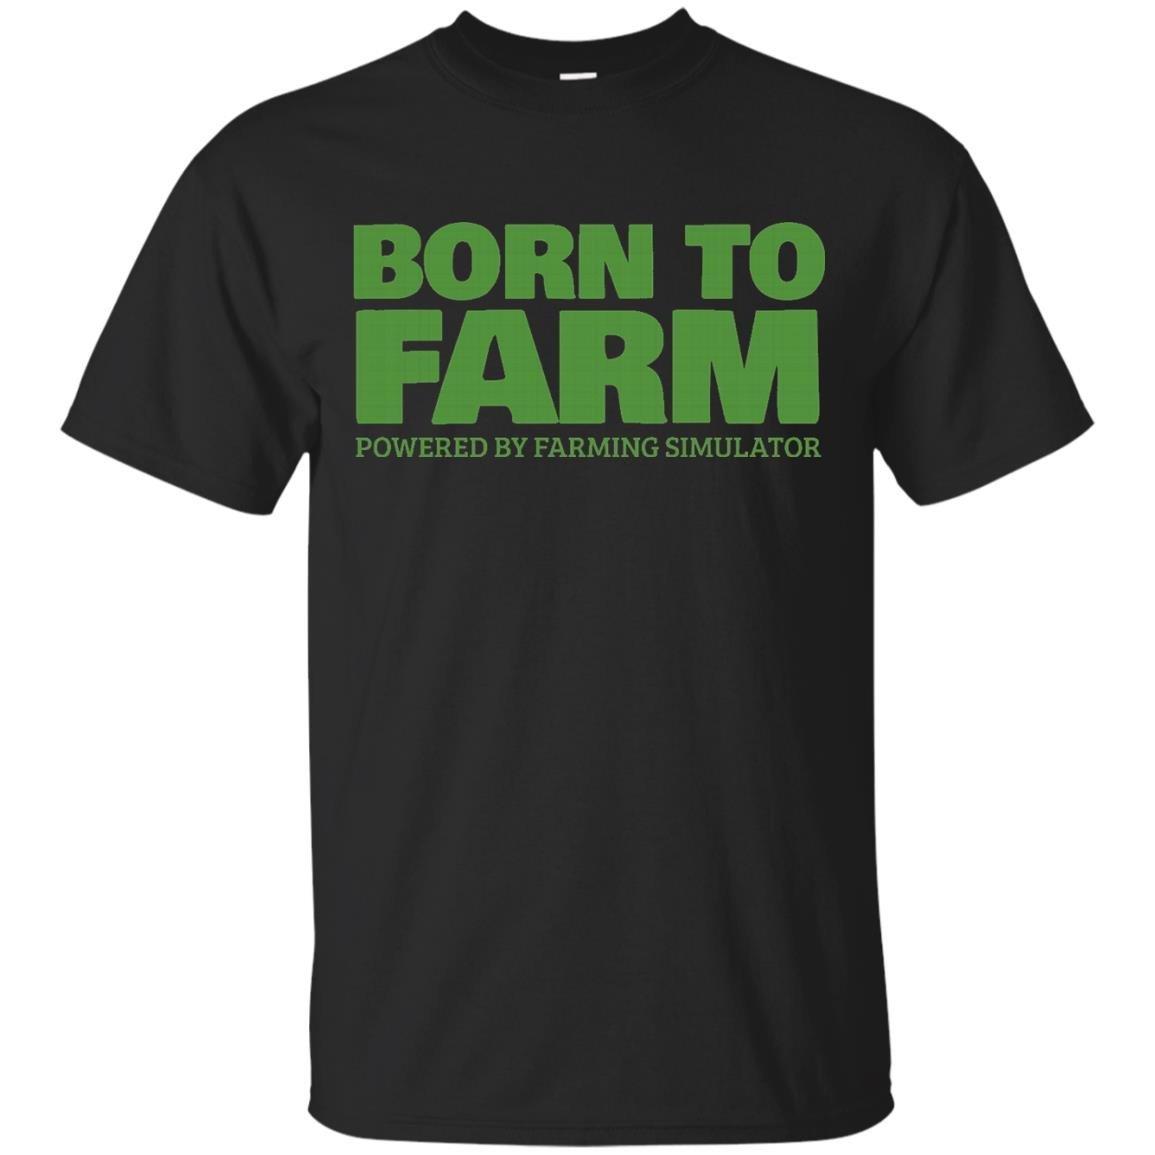 Farming Simulator – Born to Farm T-Shirt